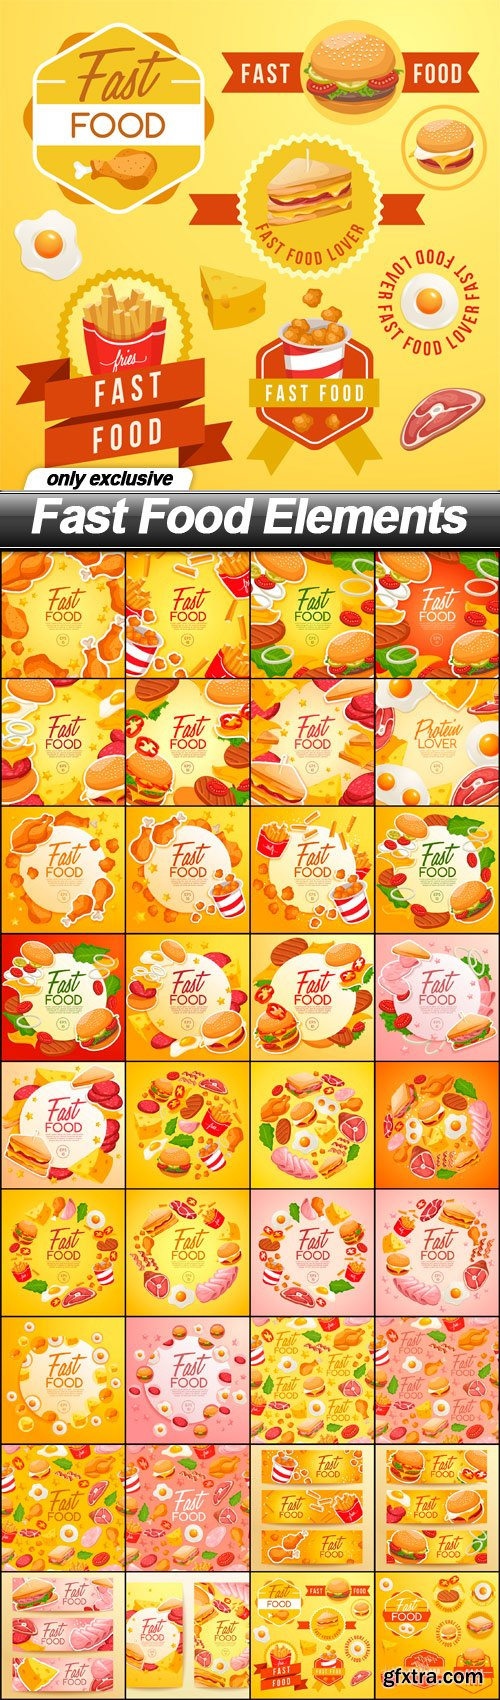 Fast Food Elements - 36 EPS